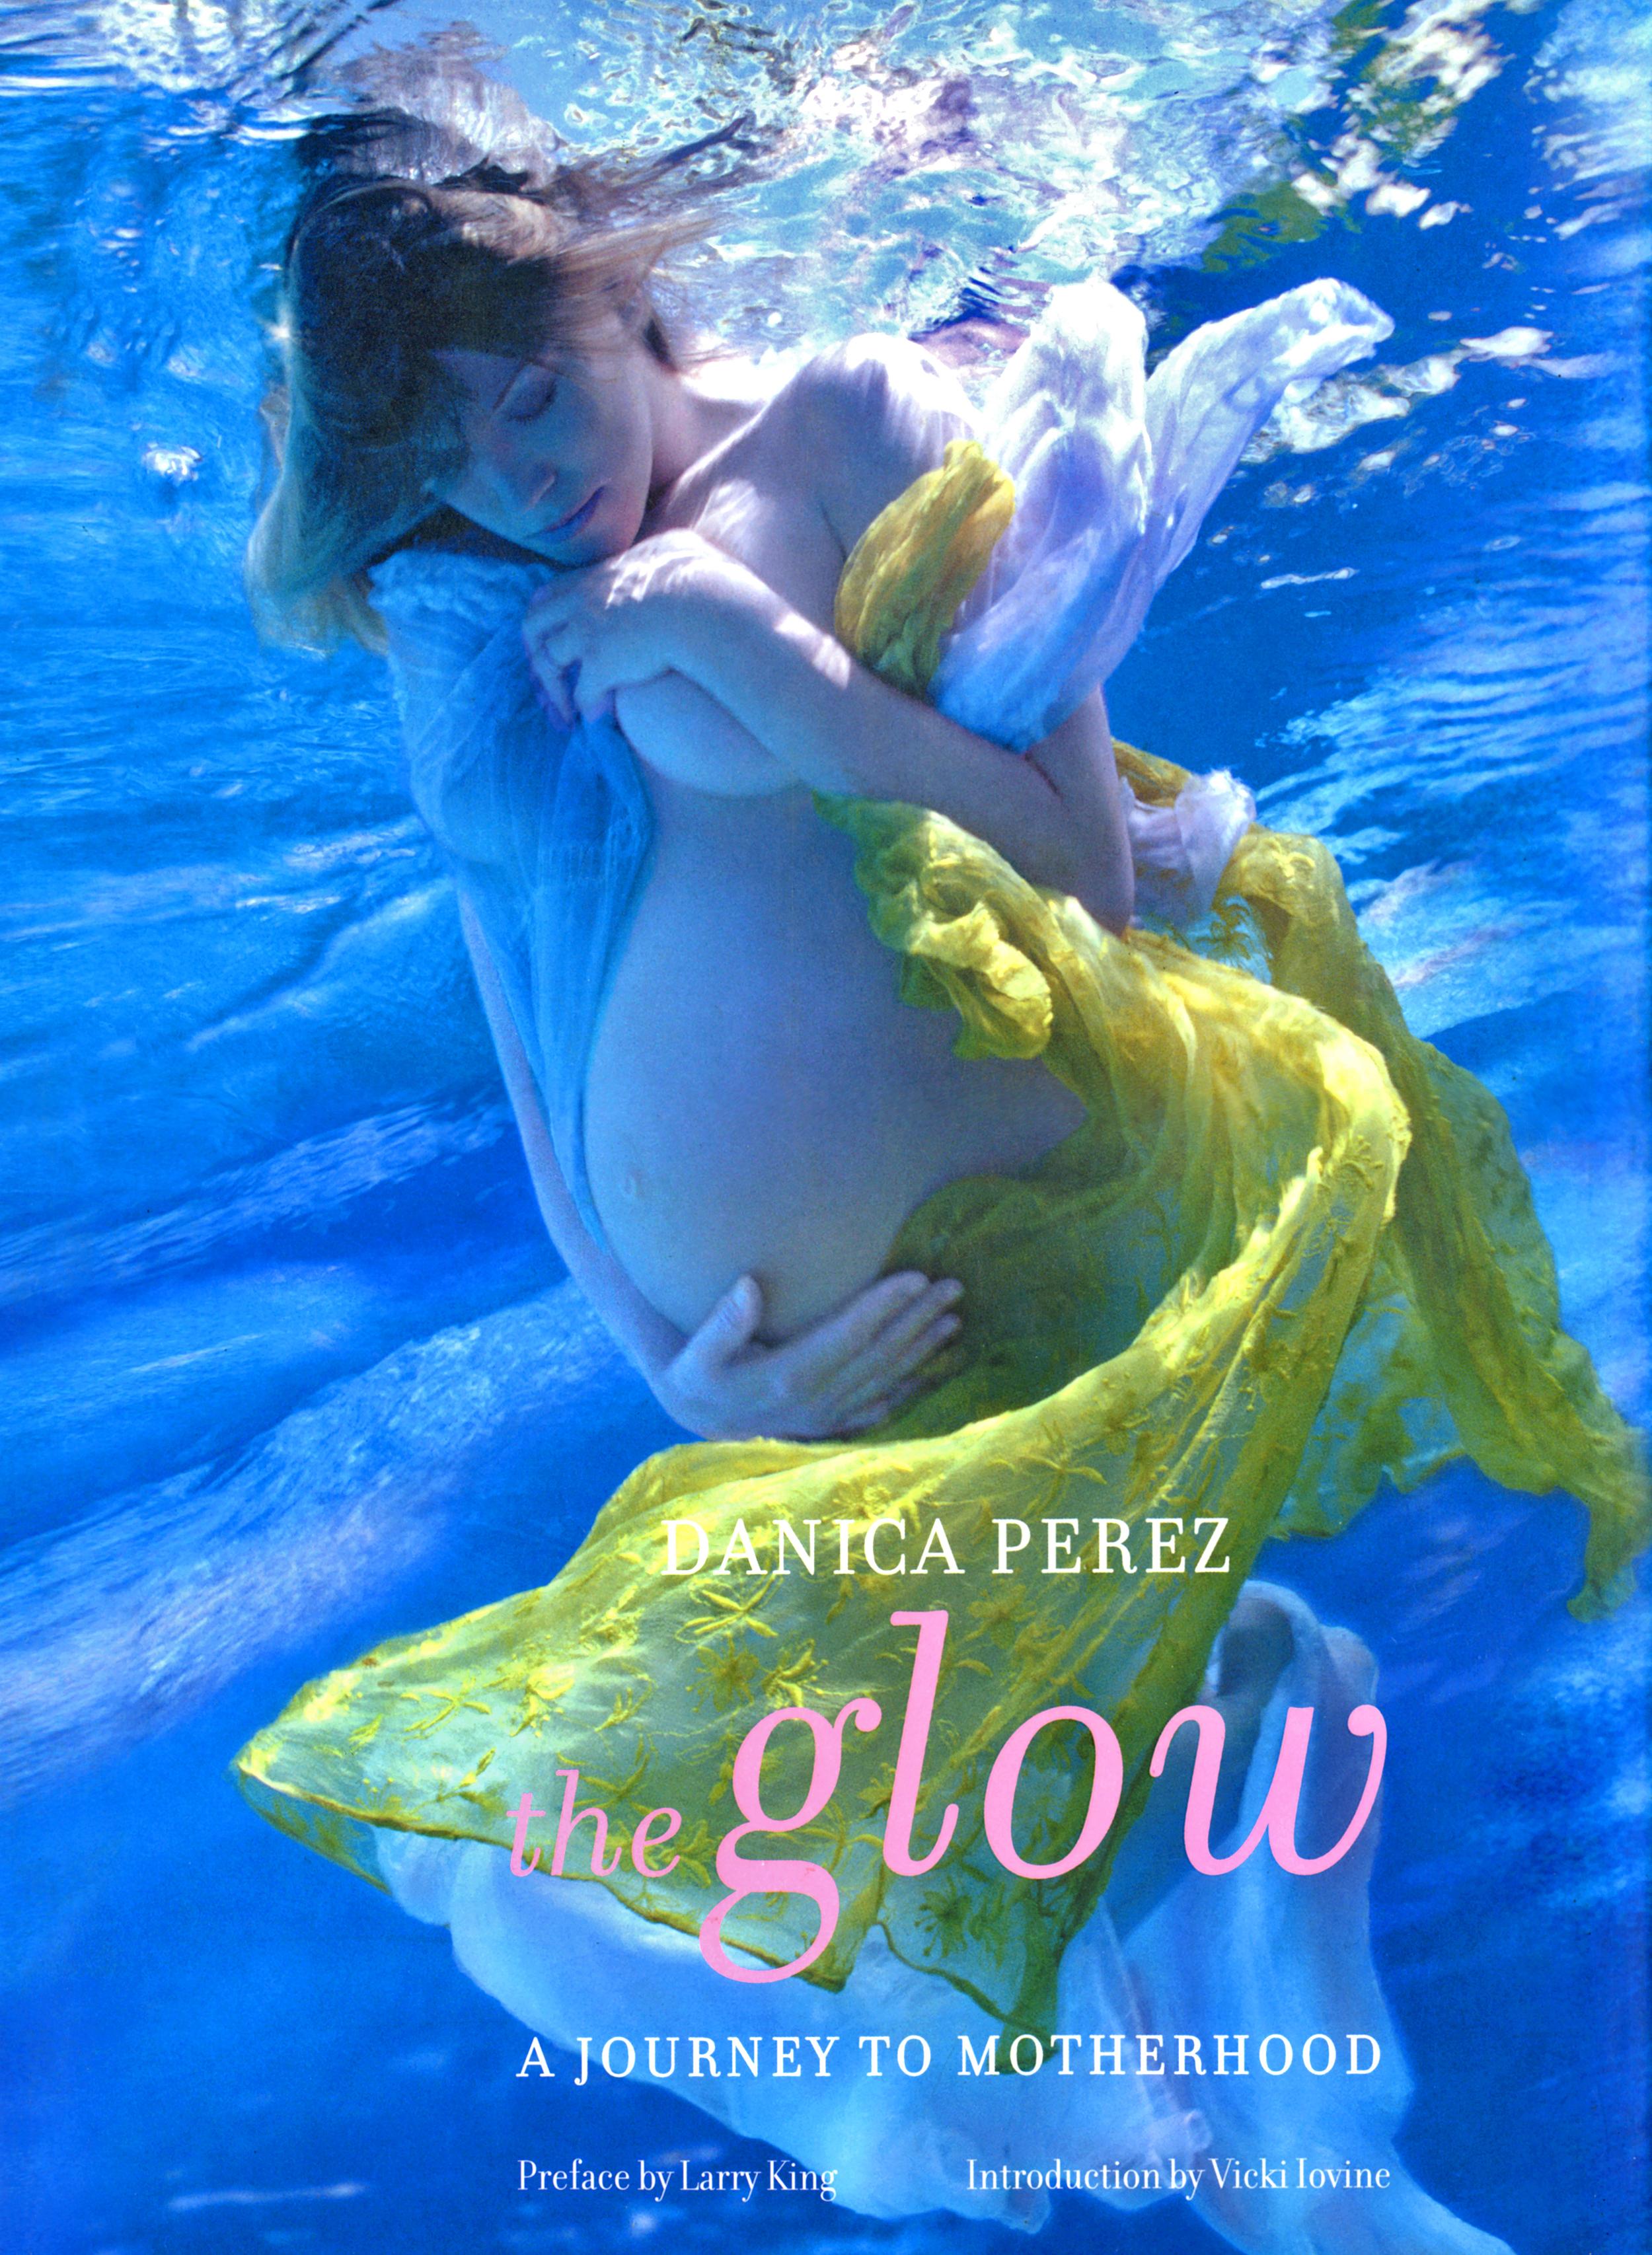 Book Cover, Motherhood, celebrity pregnancy, art beauty retouching thomas canny studio.jpg